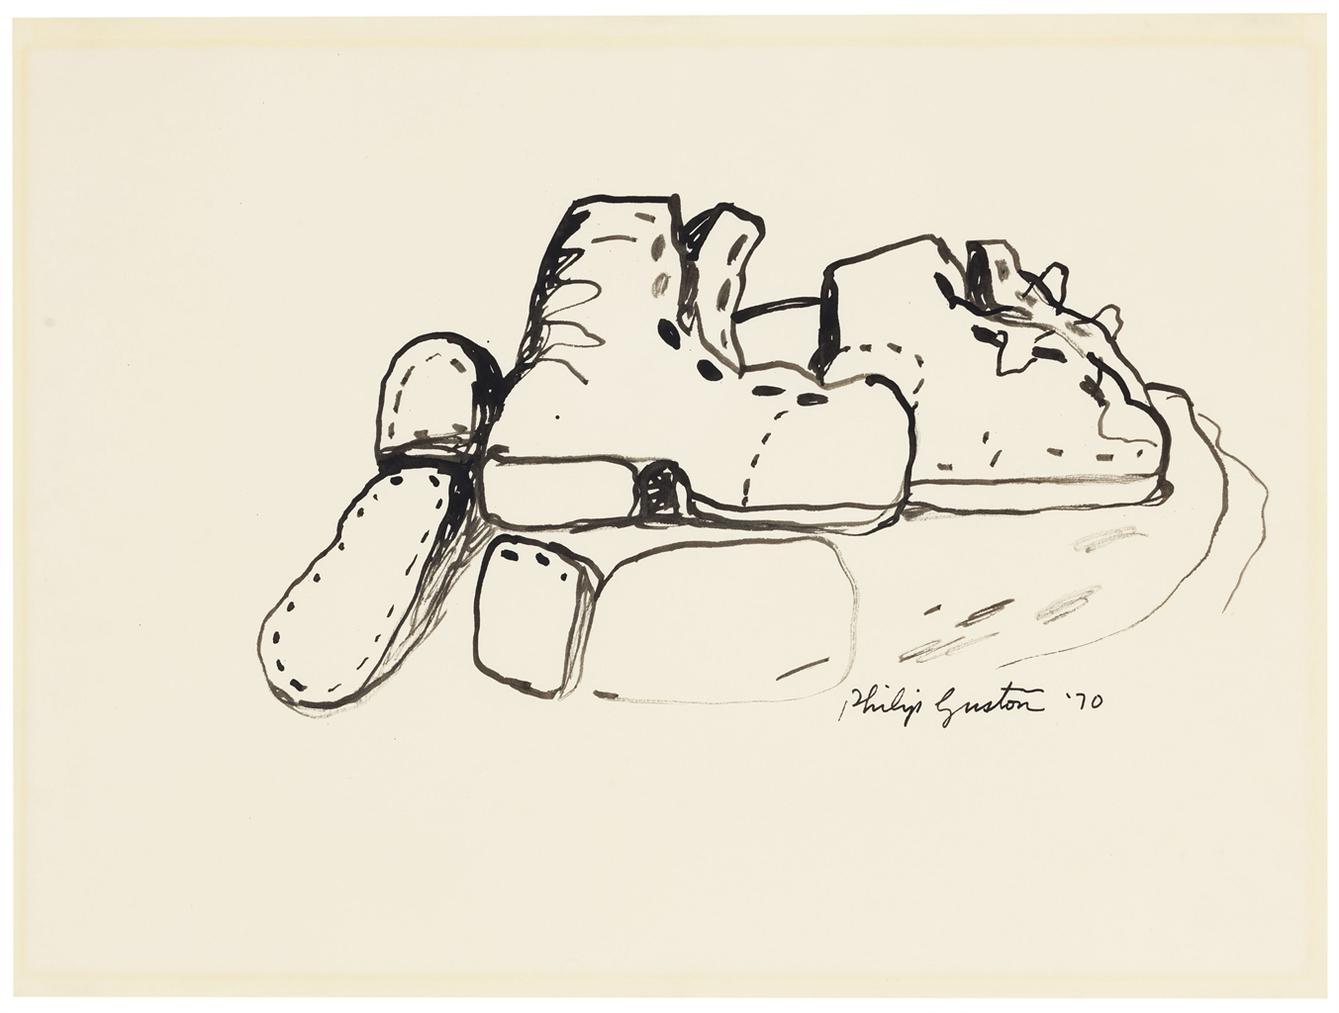 Philip Guston-Boots-1970